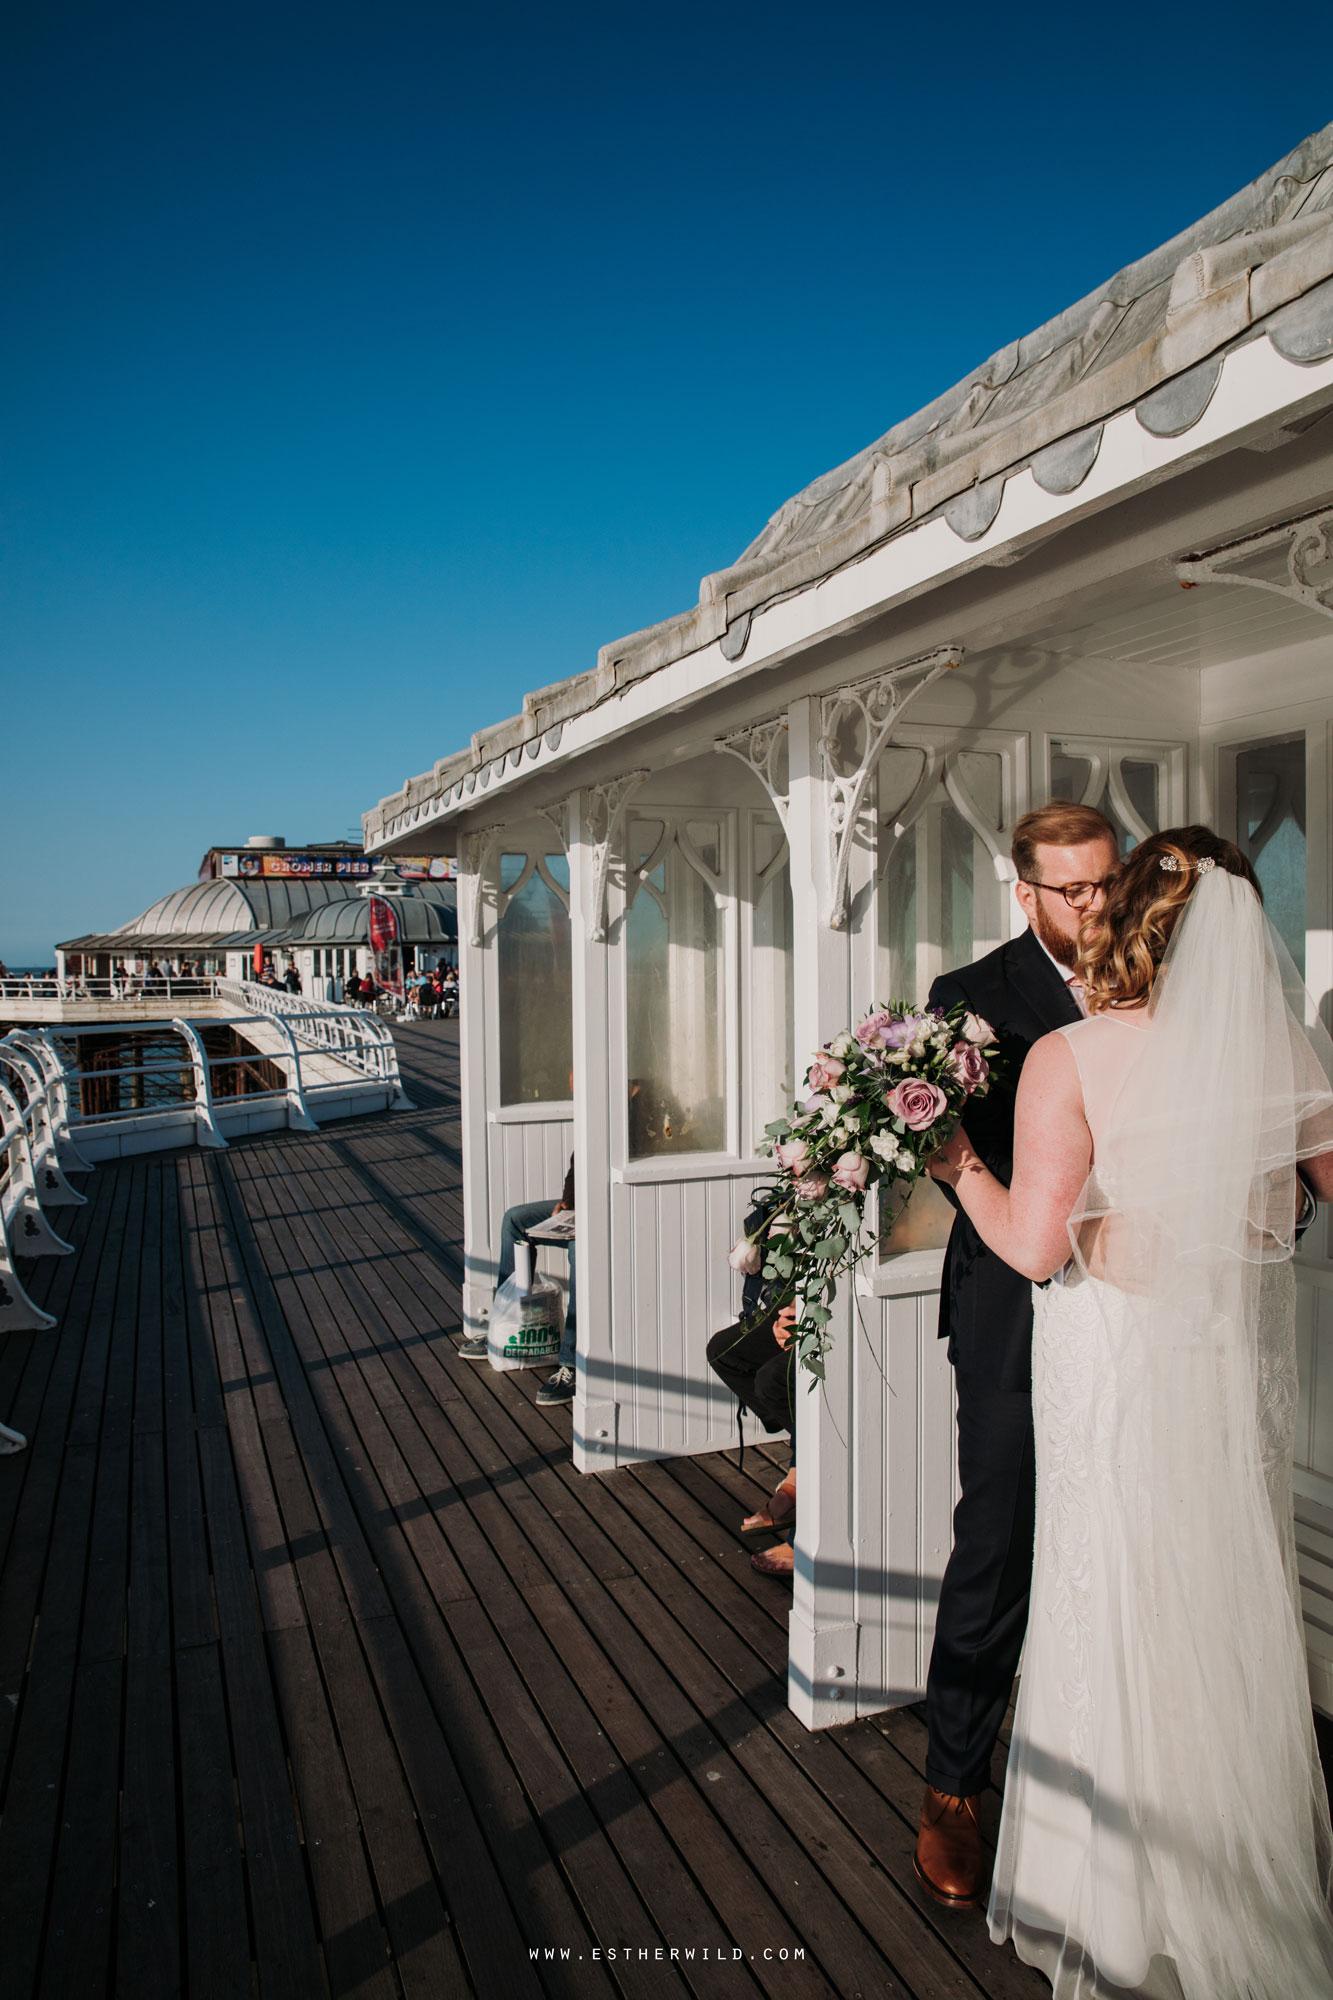 Cromer_Wedding_Beach_Outdoor_Ceremony_Norfolk_North_Lodge_Registry_Office_Rocket_House_Cafe_Cromer_Pier_IMG_4654.jpg